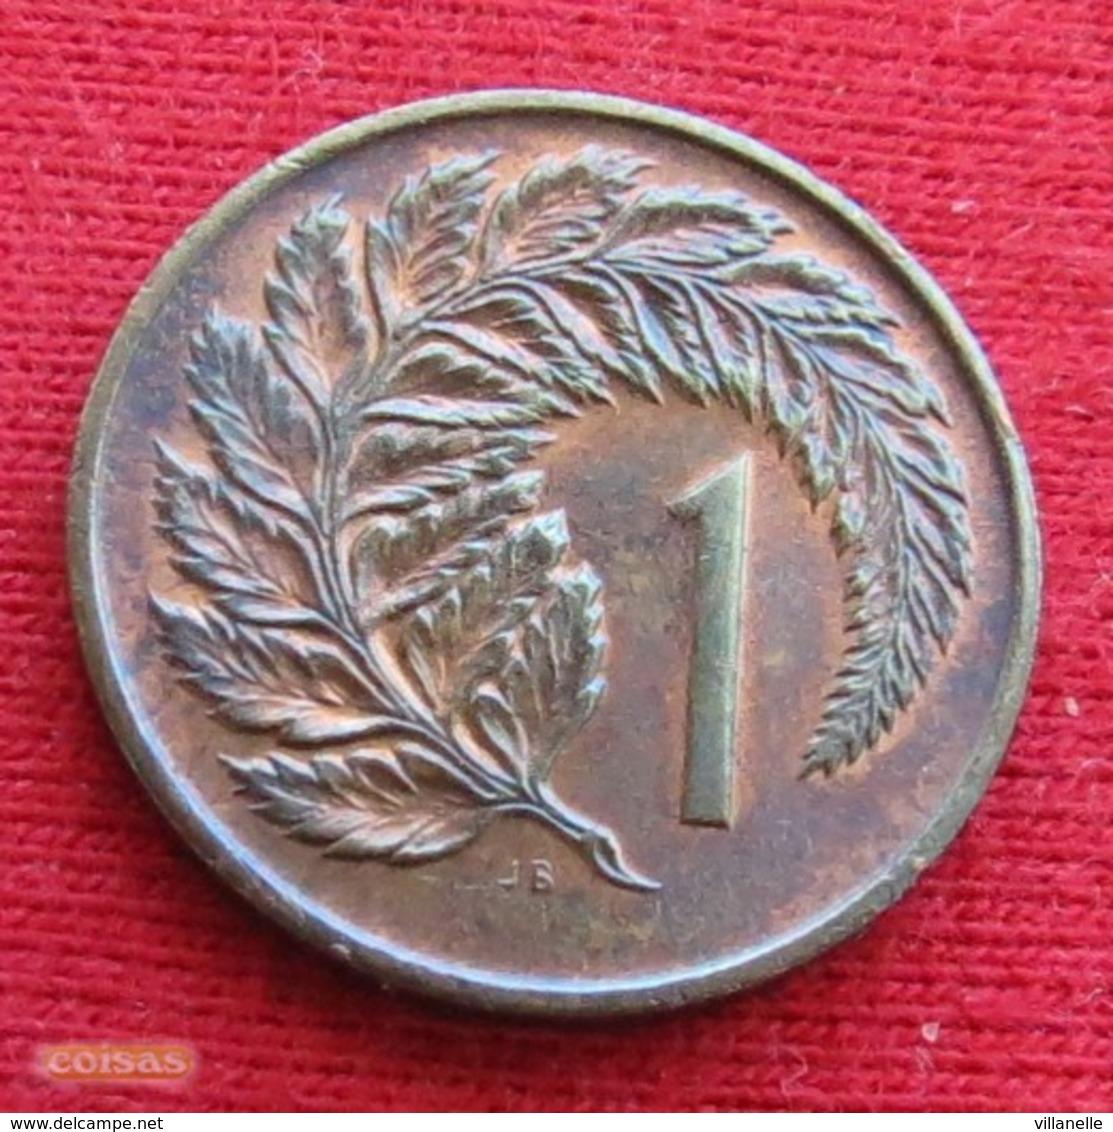 New Zealand 1 Cent 1970 KM# 31.1  Nova Zelandia Nuova Zelanda Nouvelle Zelande - New Zealand